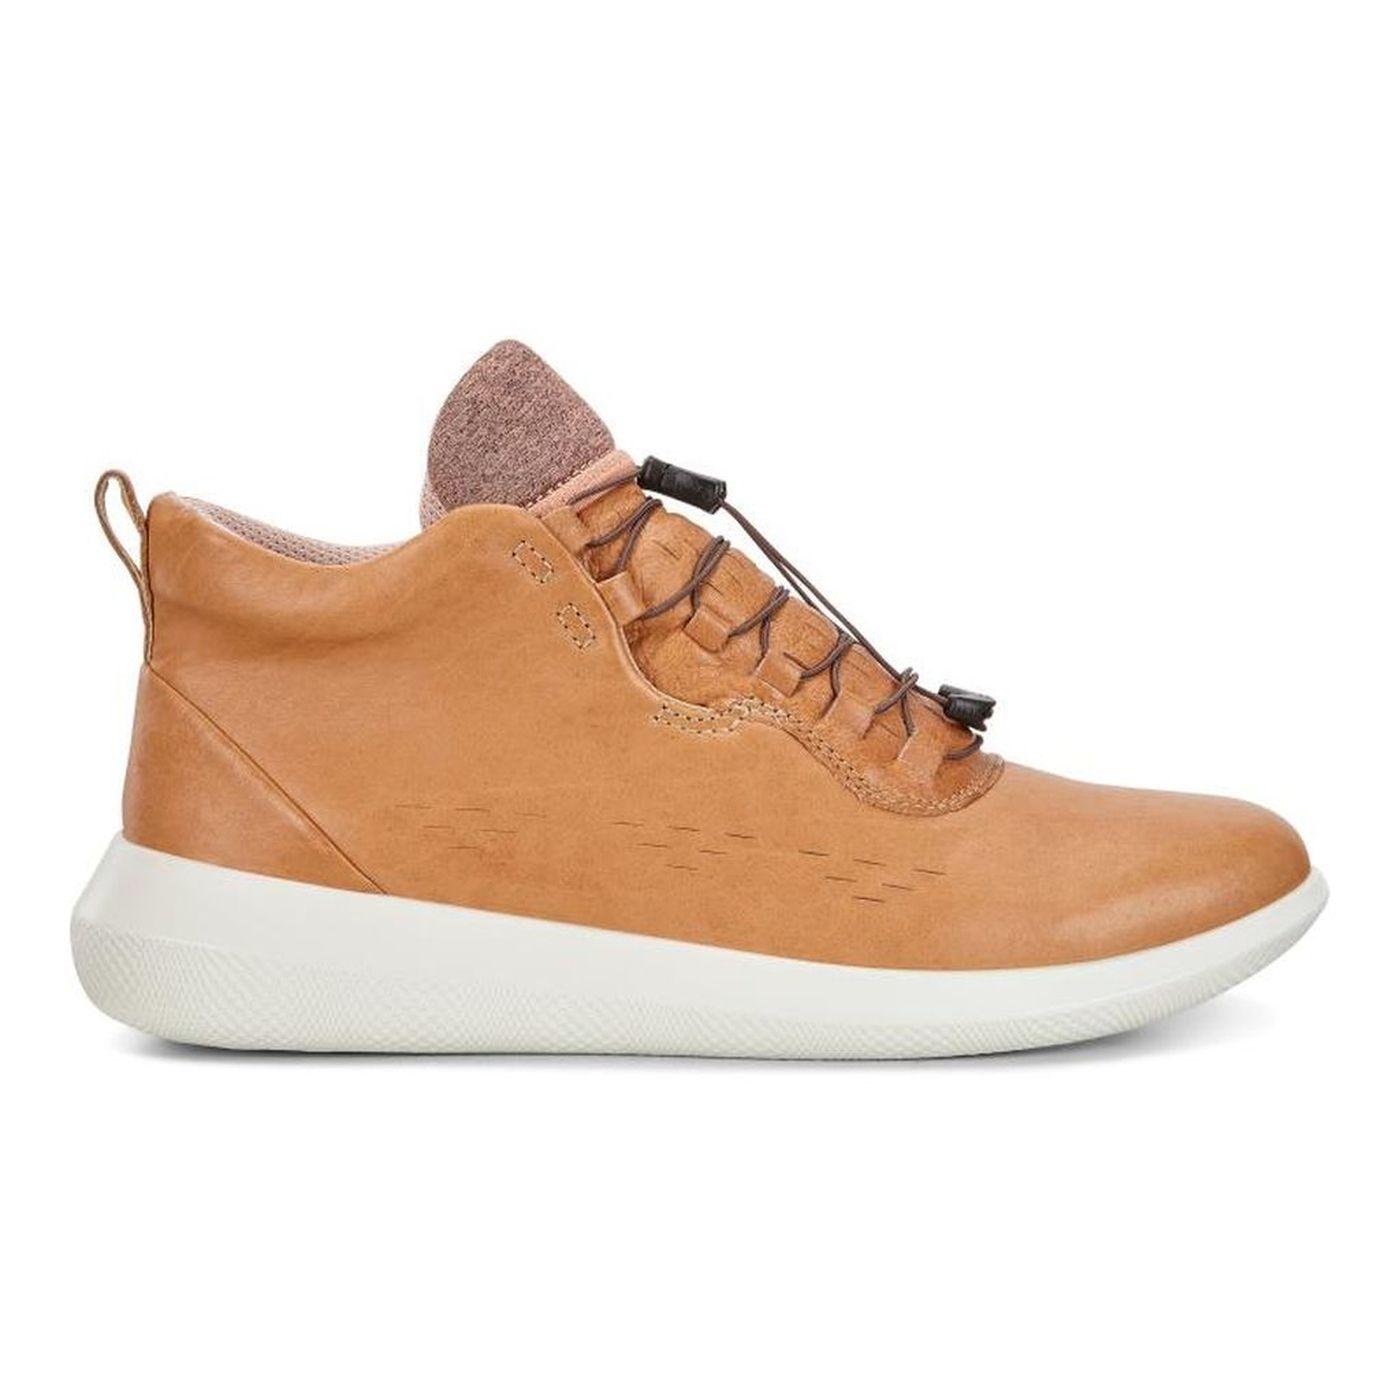 ECCO Women's Scinapse High Top | Women's Boots | ECCO® Shoes